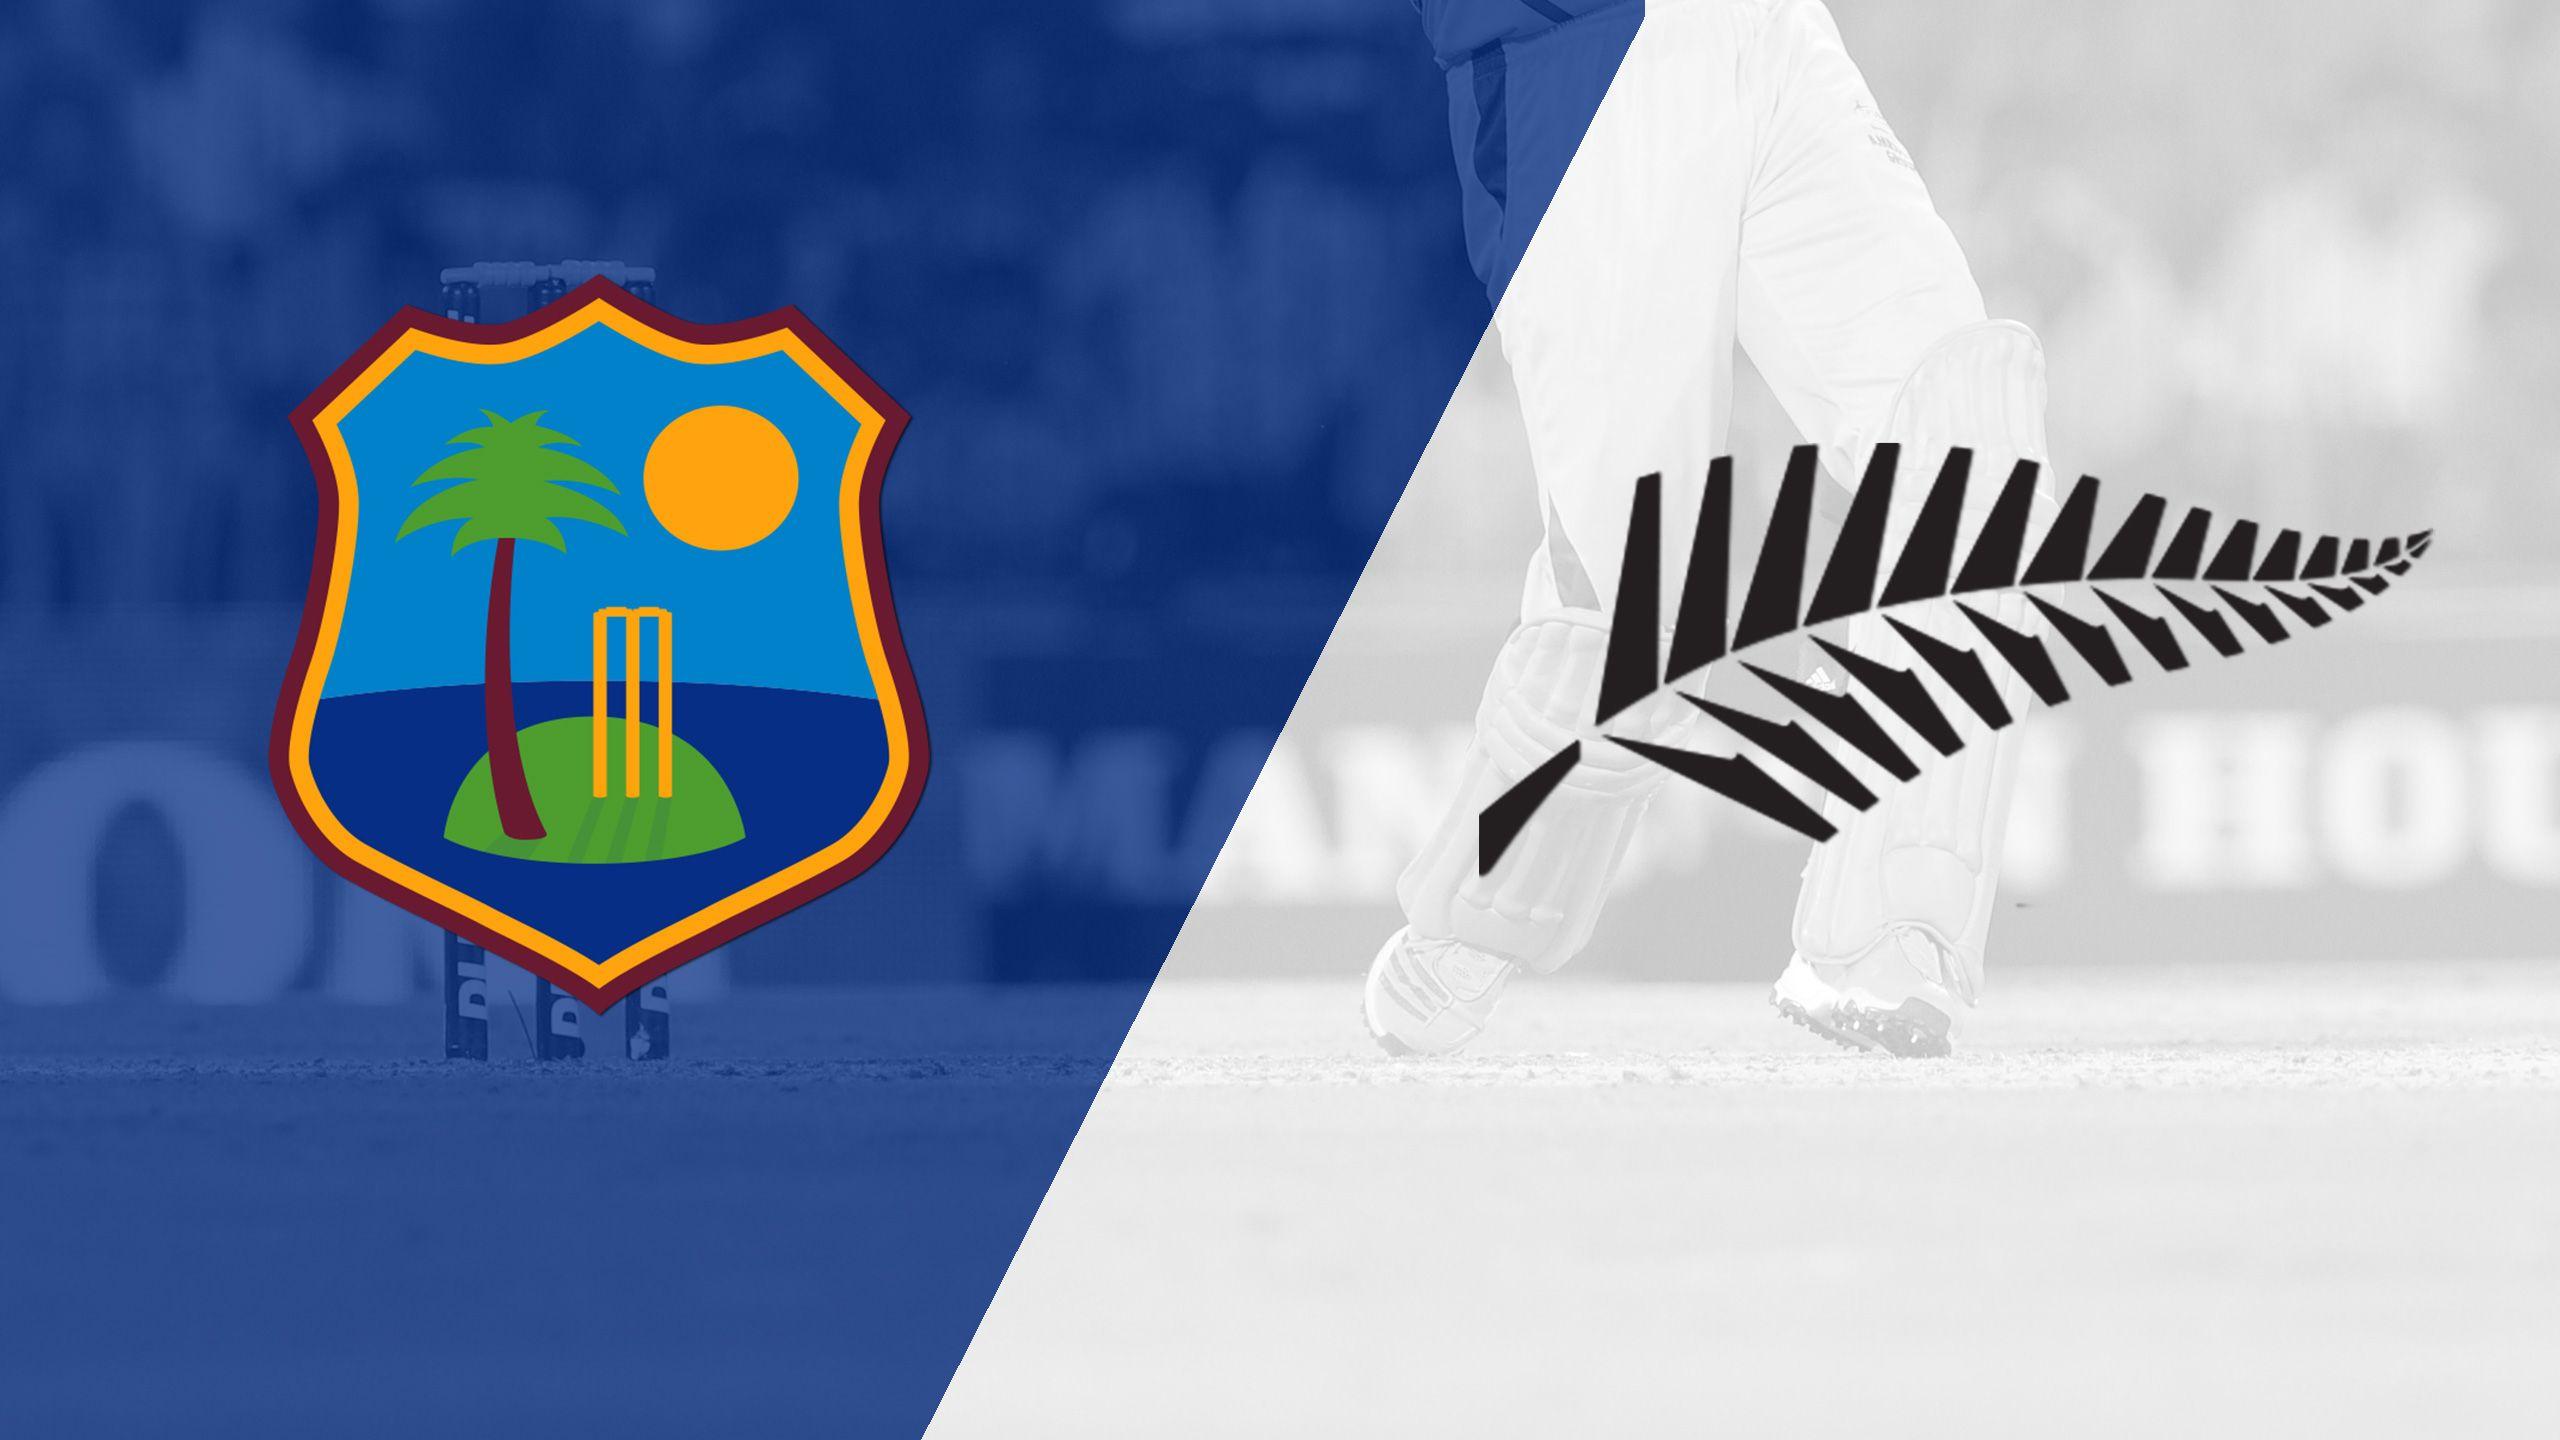 West Indies vs. New Zealand (Test 2, Day 4) (International Cricket)